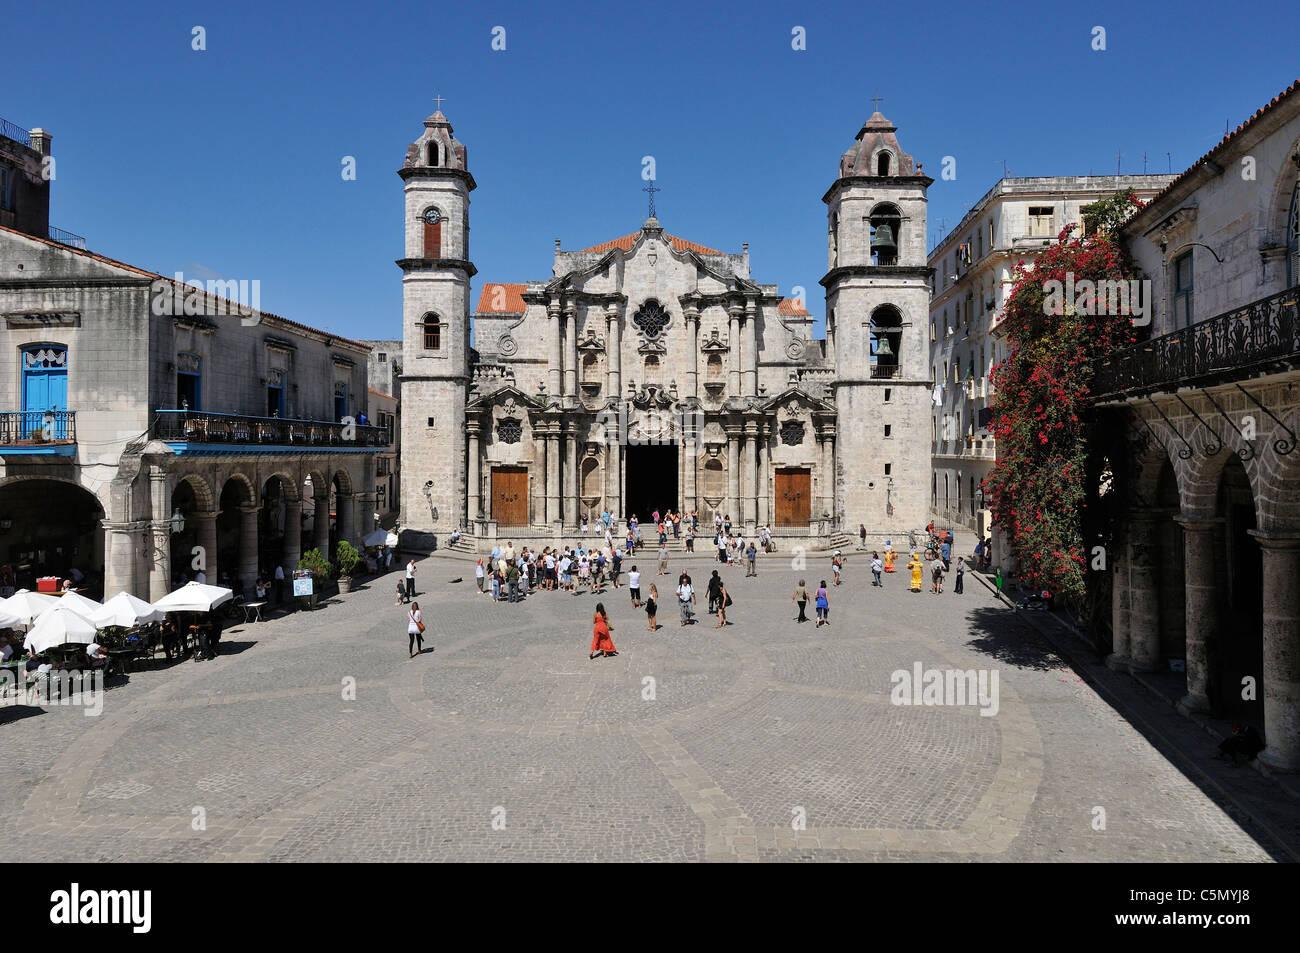 Havana. Cuba. Habana Vieja / Old Havana. Catedral de La Habana, Plaza de la Catedral. - Stock Image